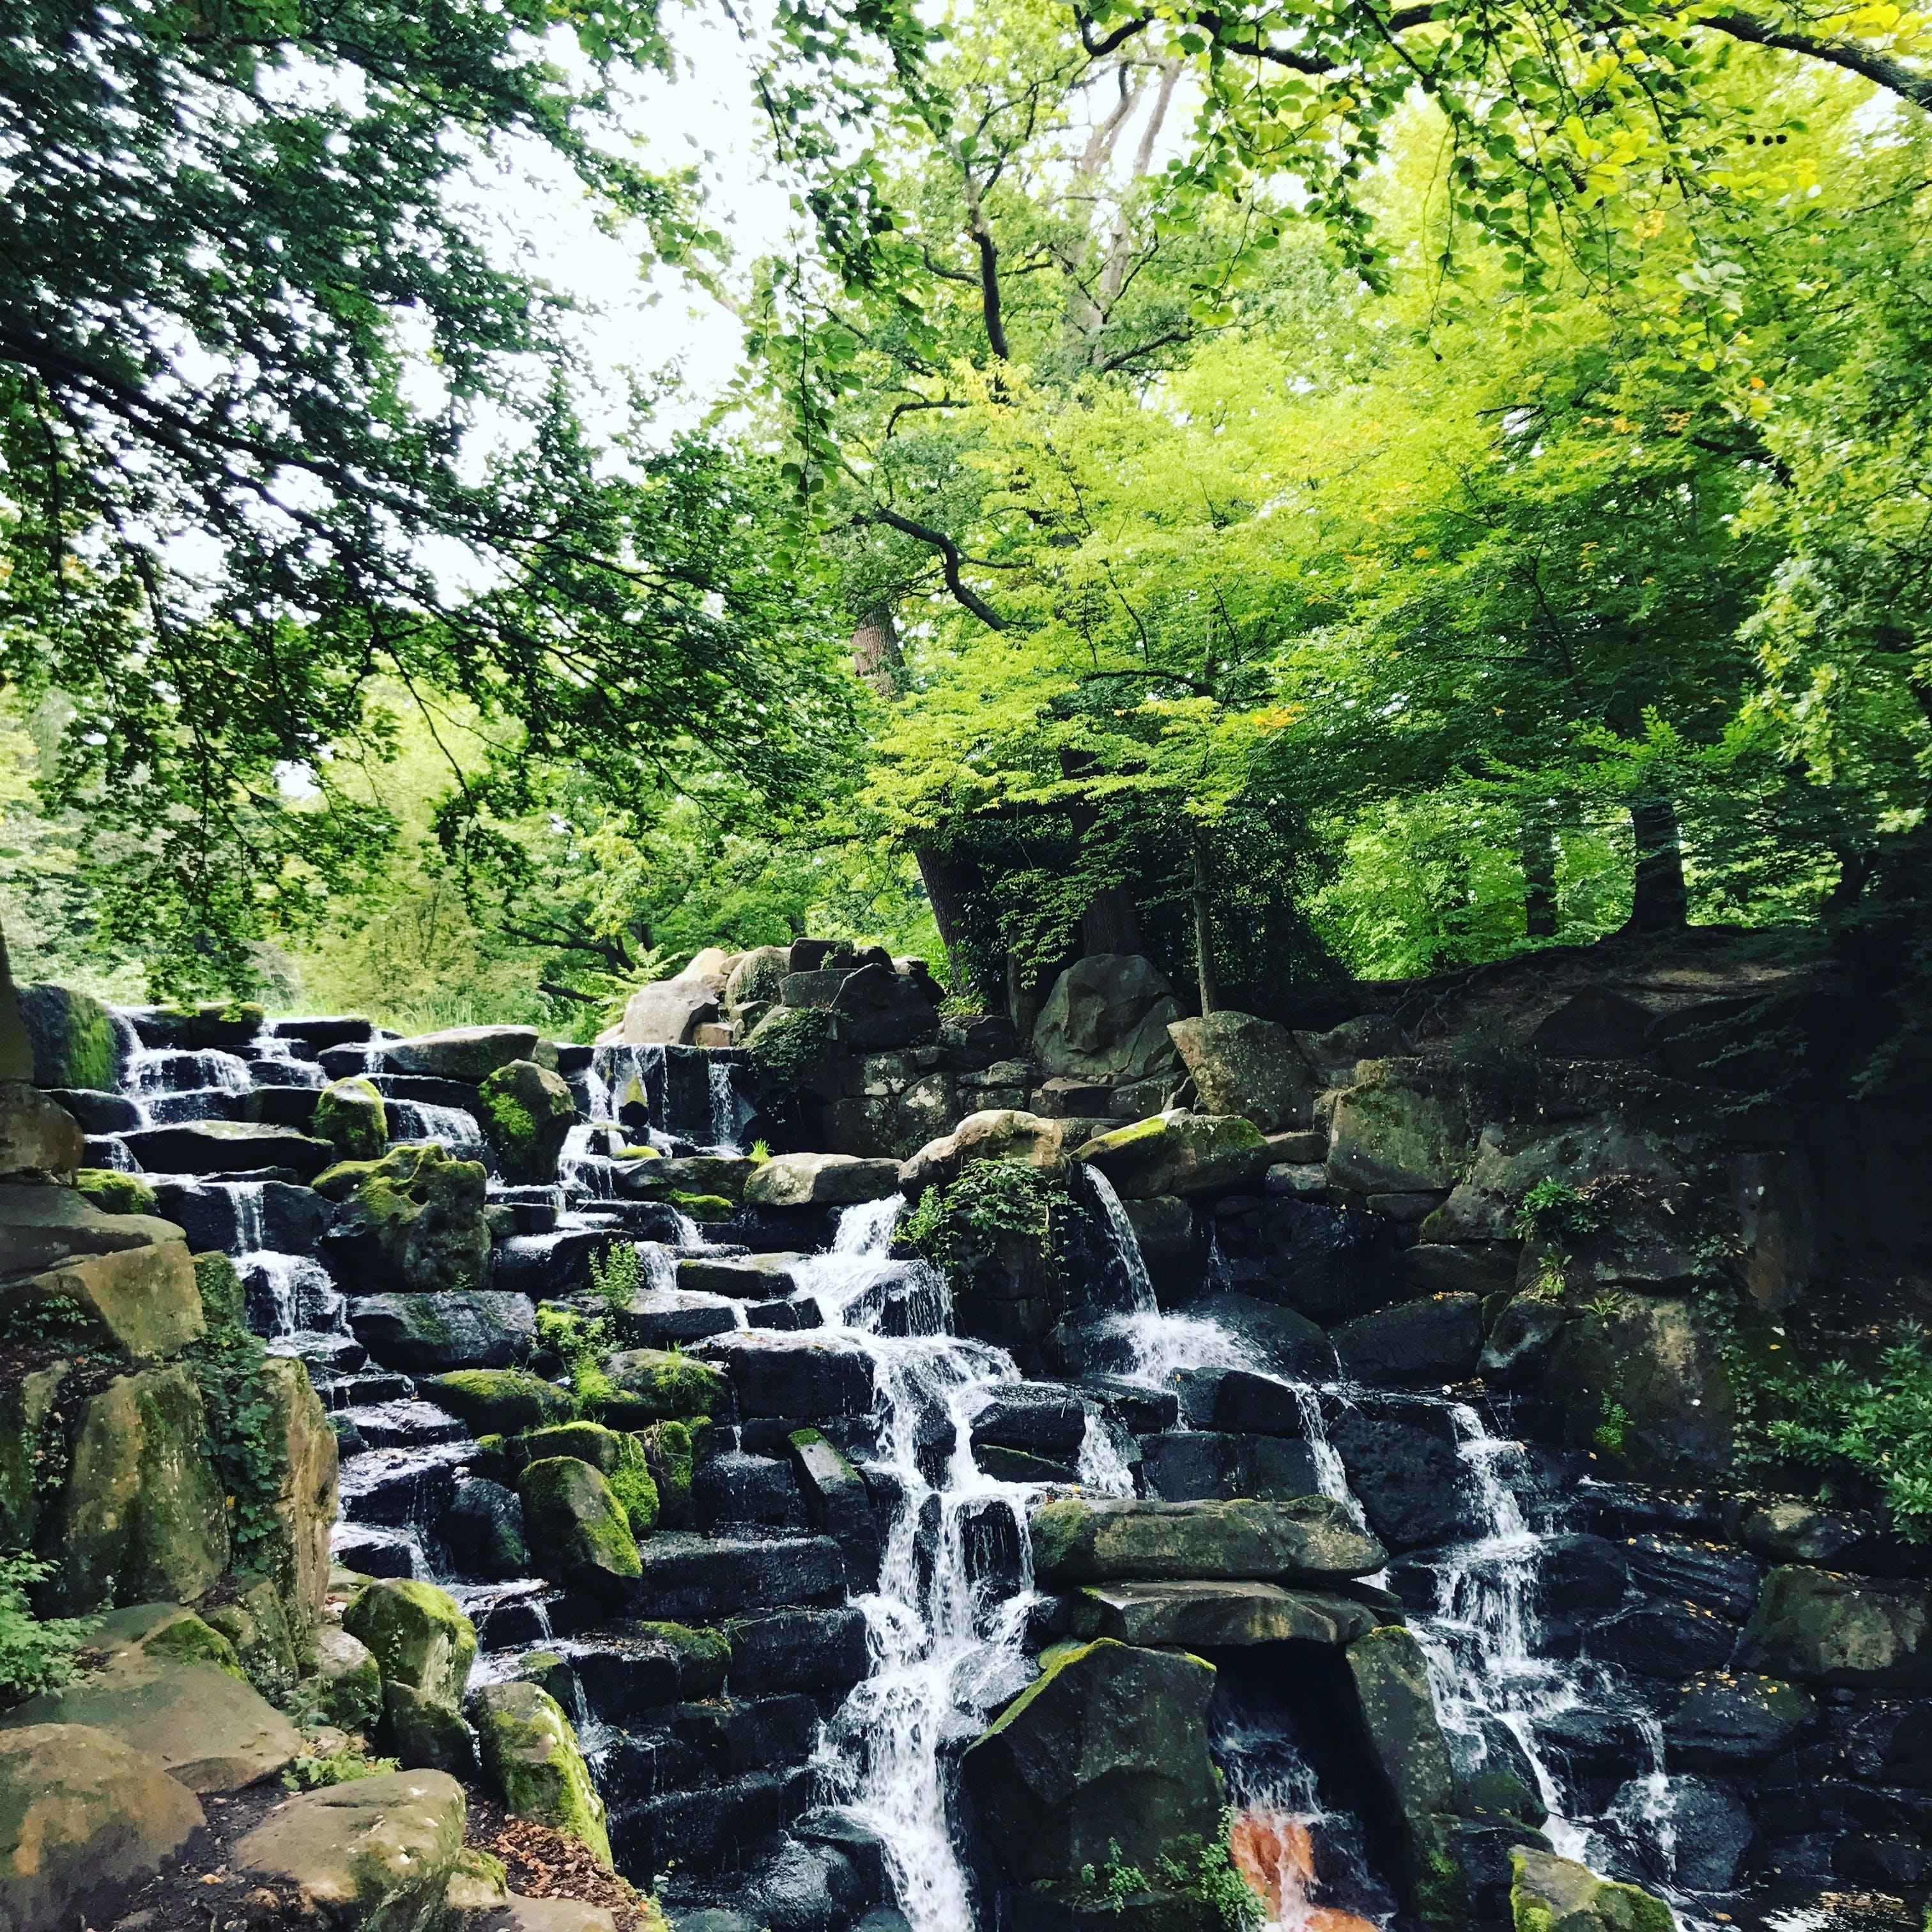 Free stock photo of Mossy rocks, outdoors, trees, waterfall